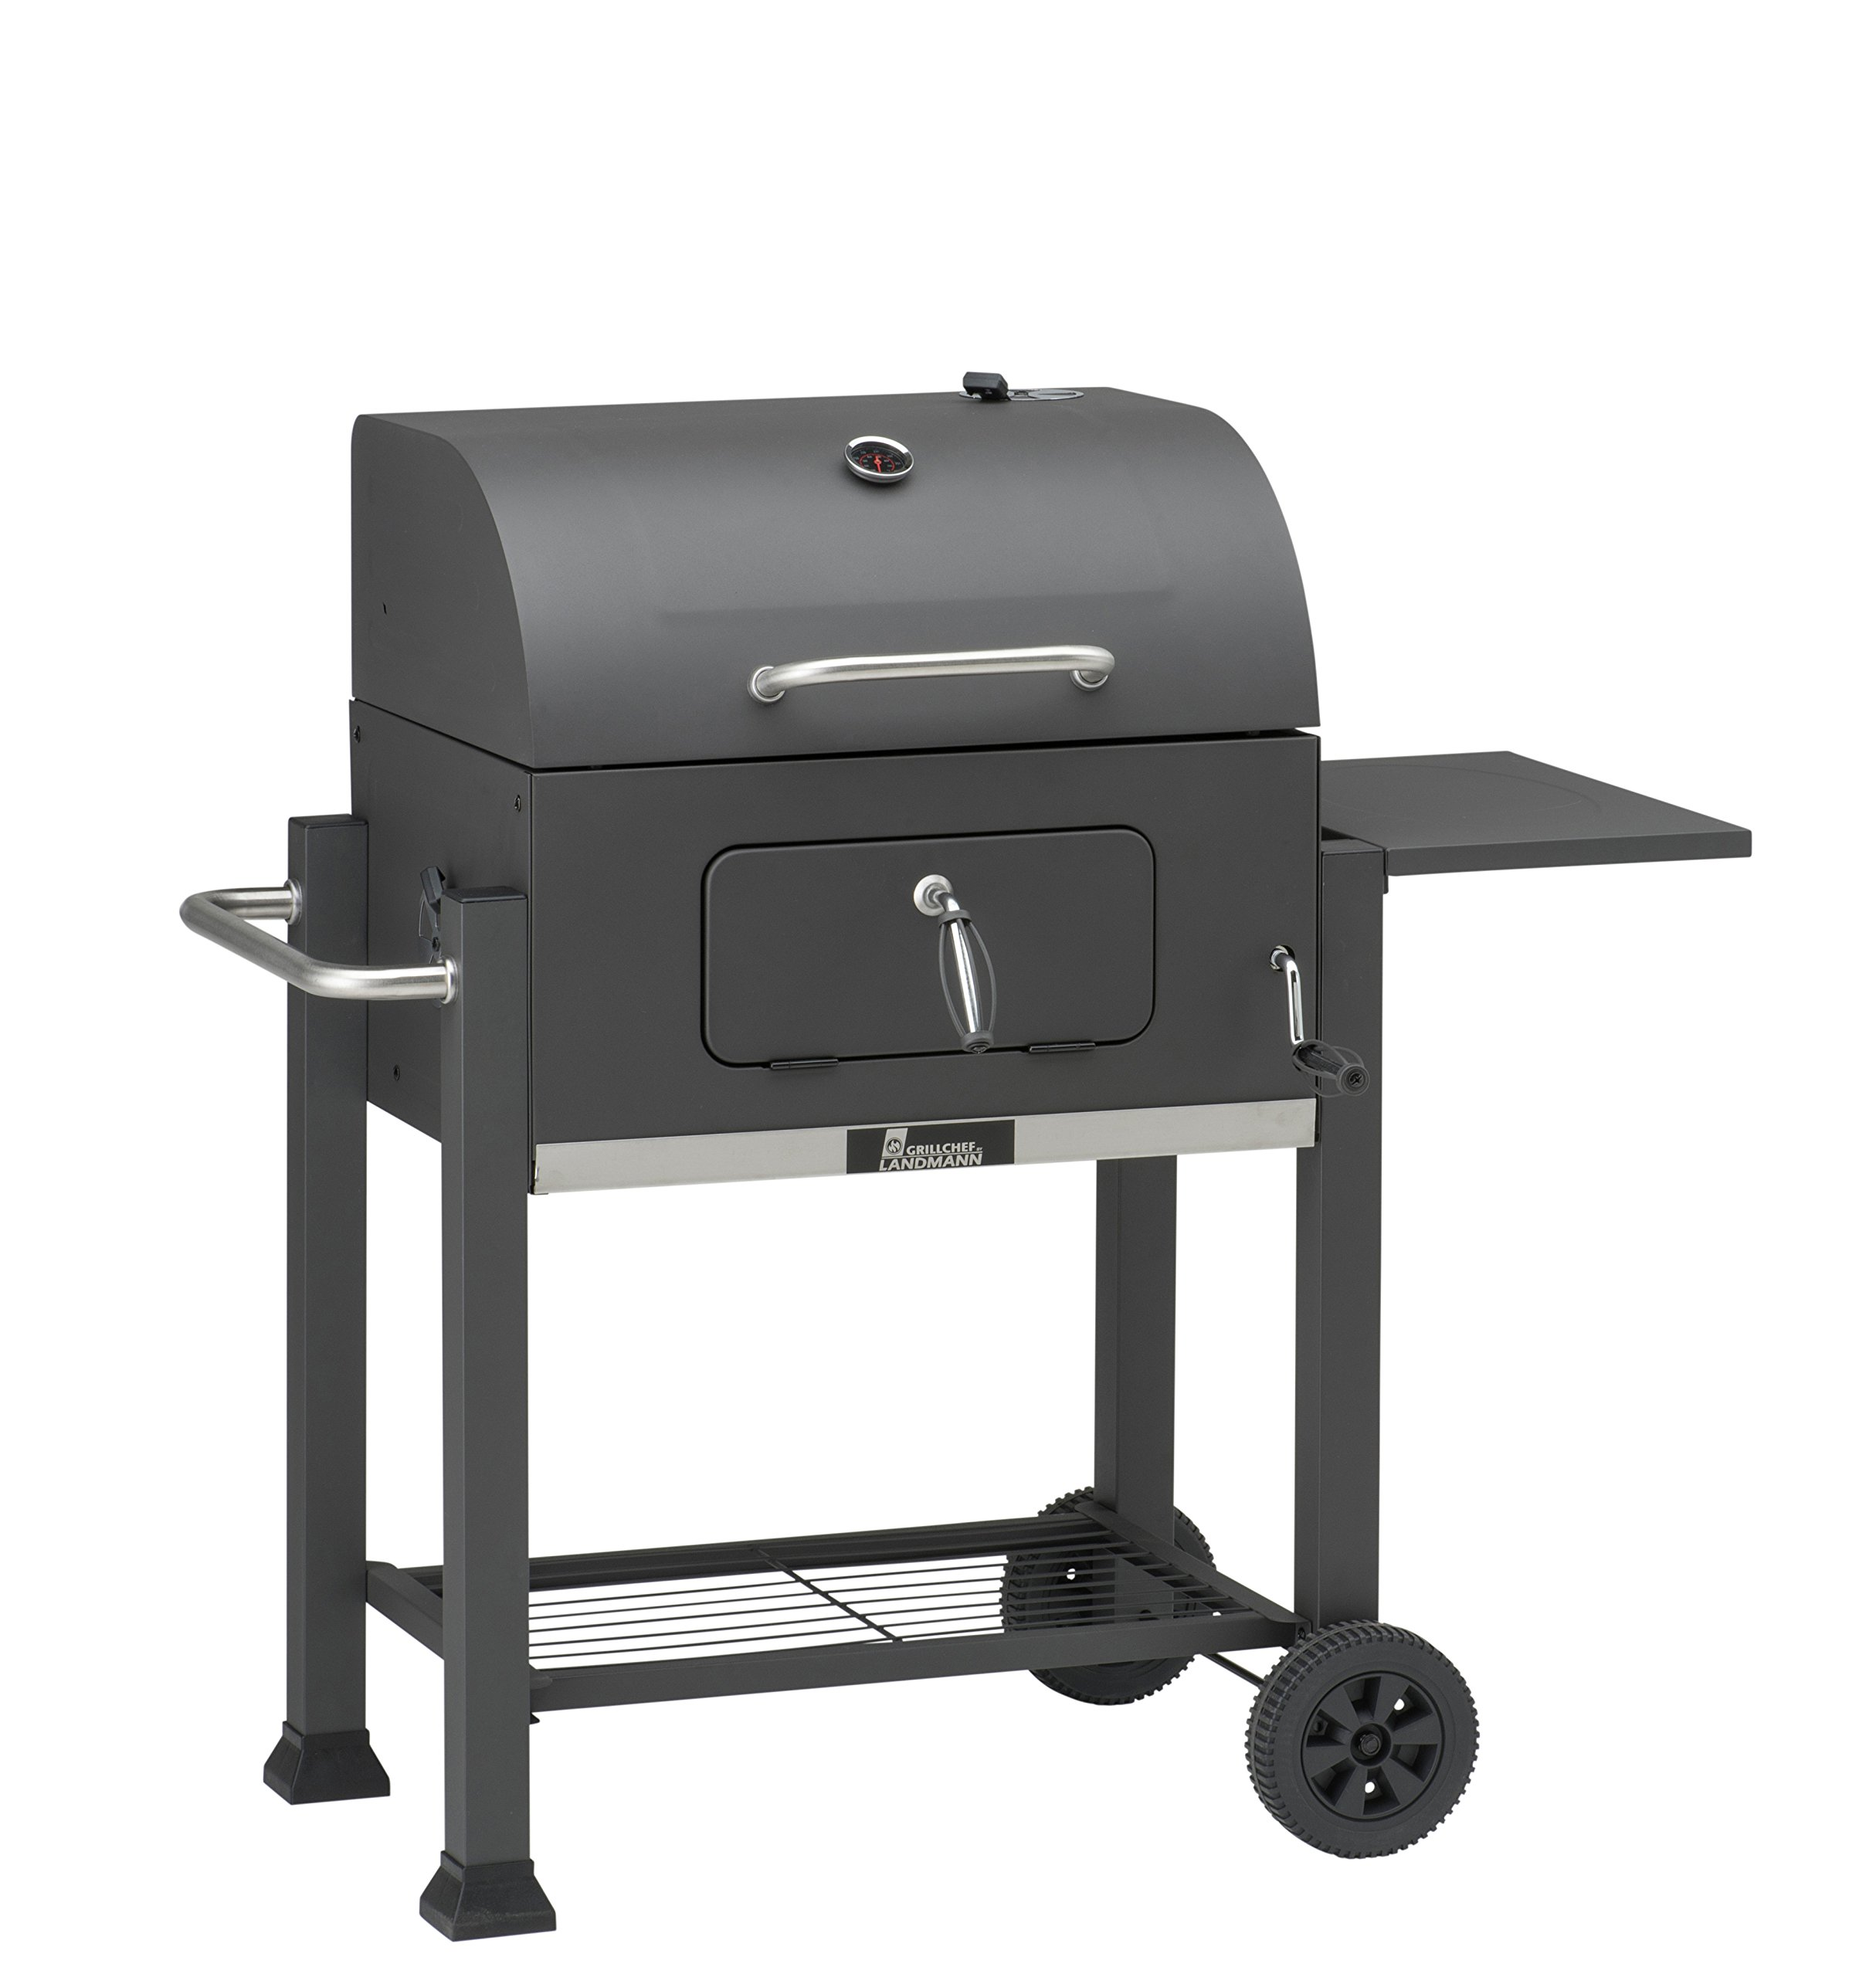 GrillChef Comfort charcoal grill cart, black